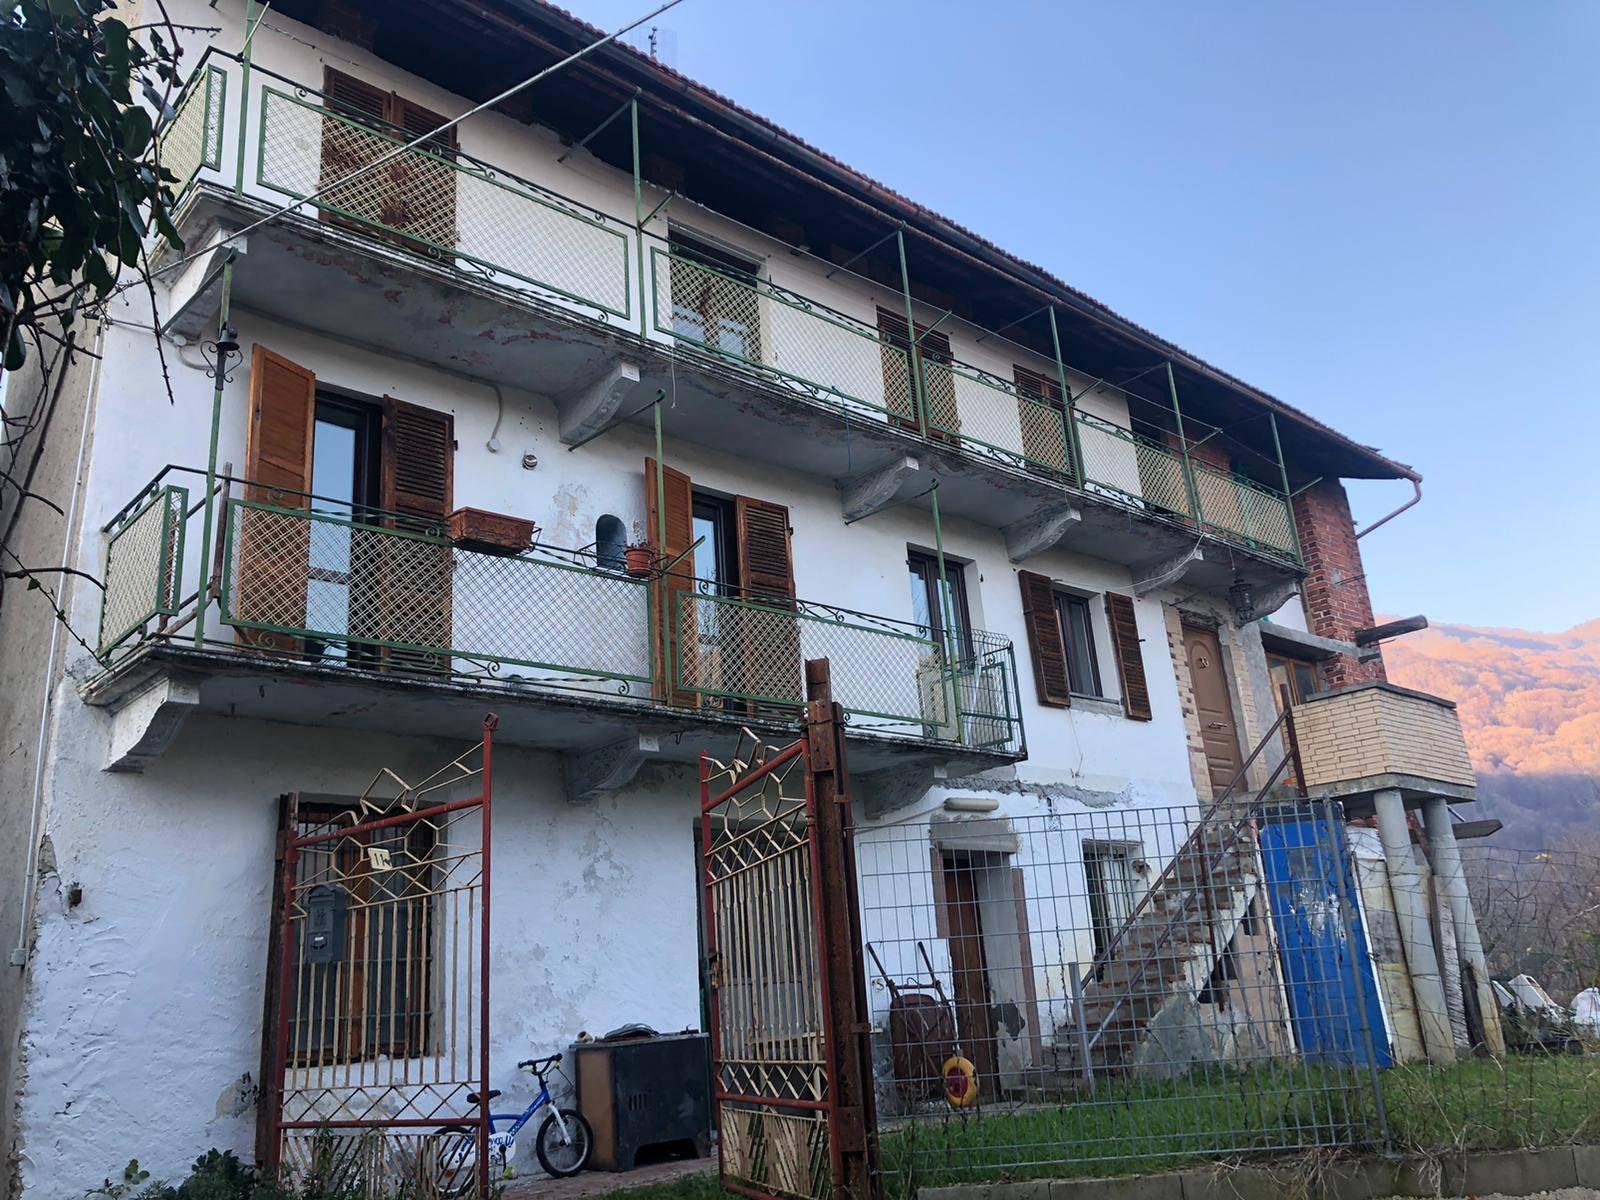 Rubiana (TO): Casa indipendente con terreno